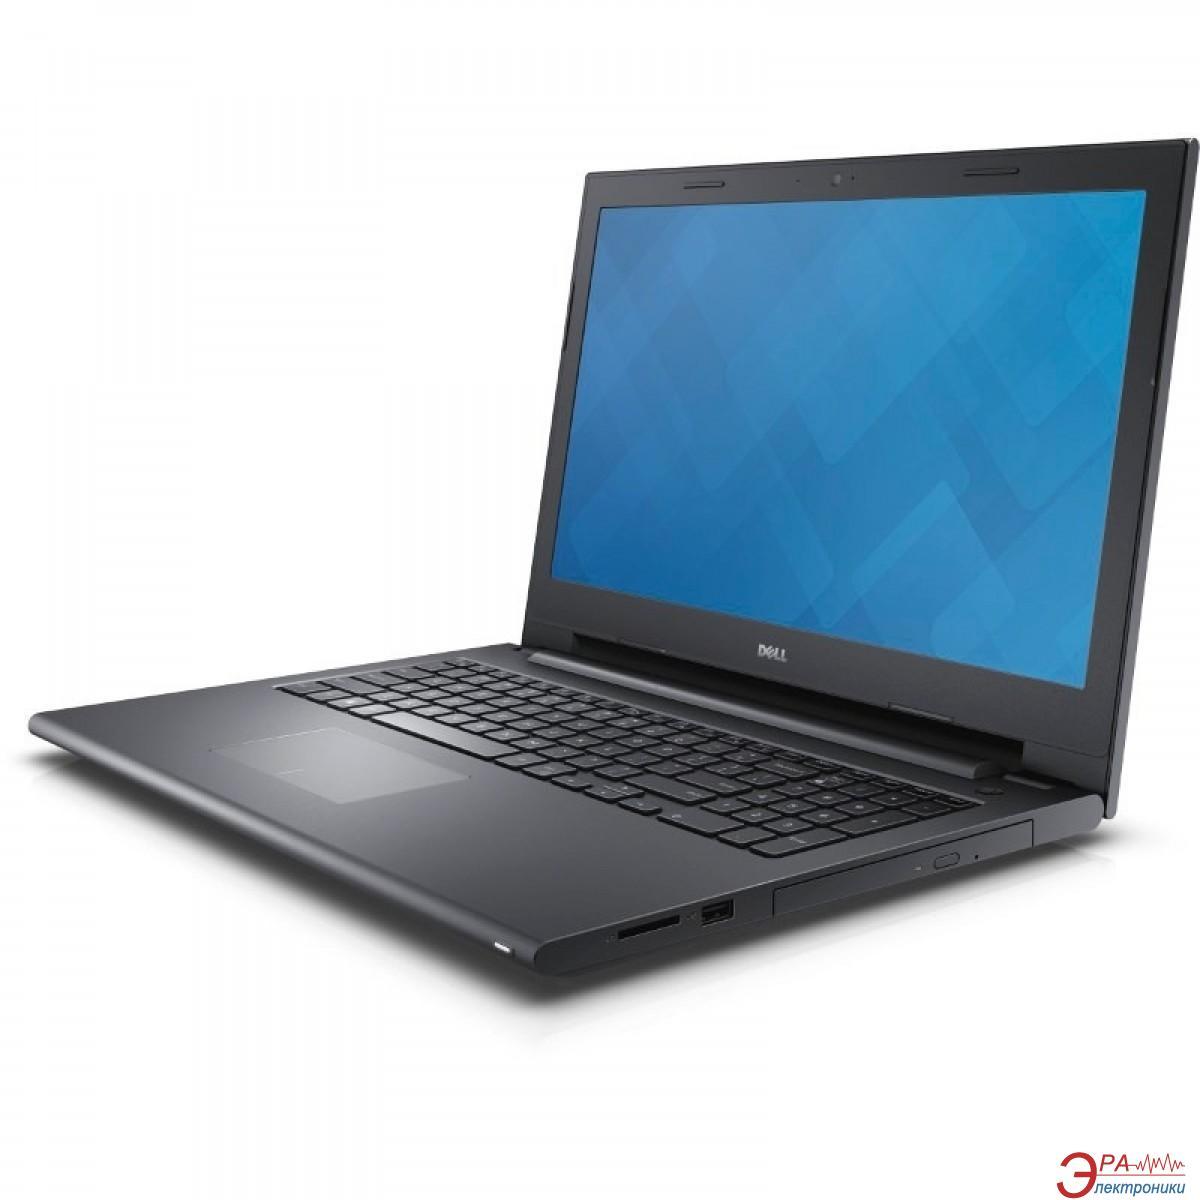 Ноутбук Dell Inspiron 3542 (I35345DIW-46) Black 15,6